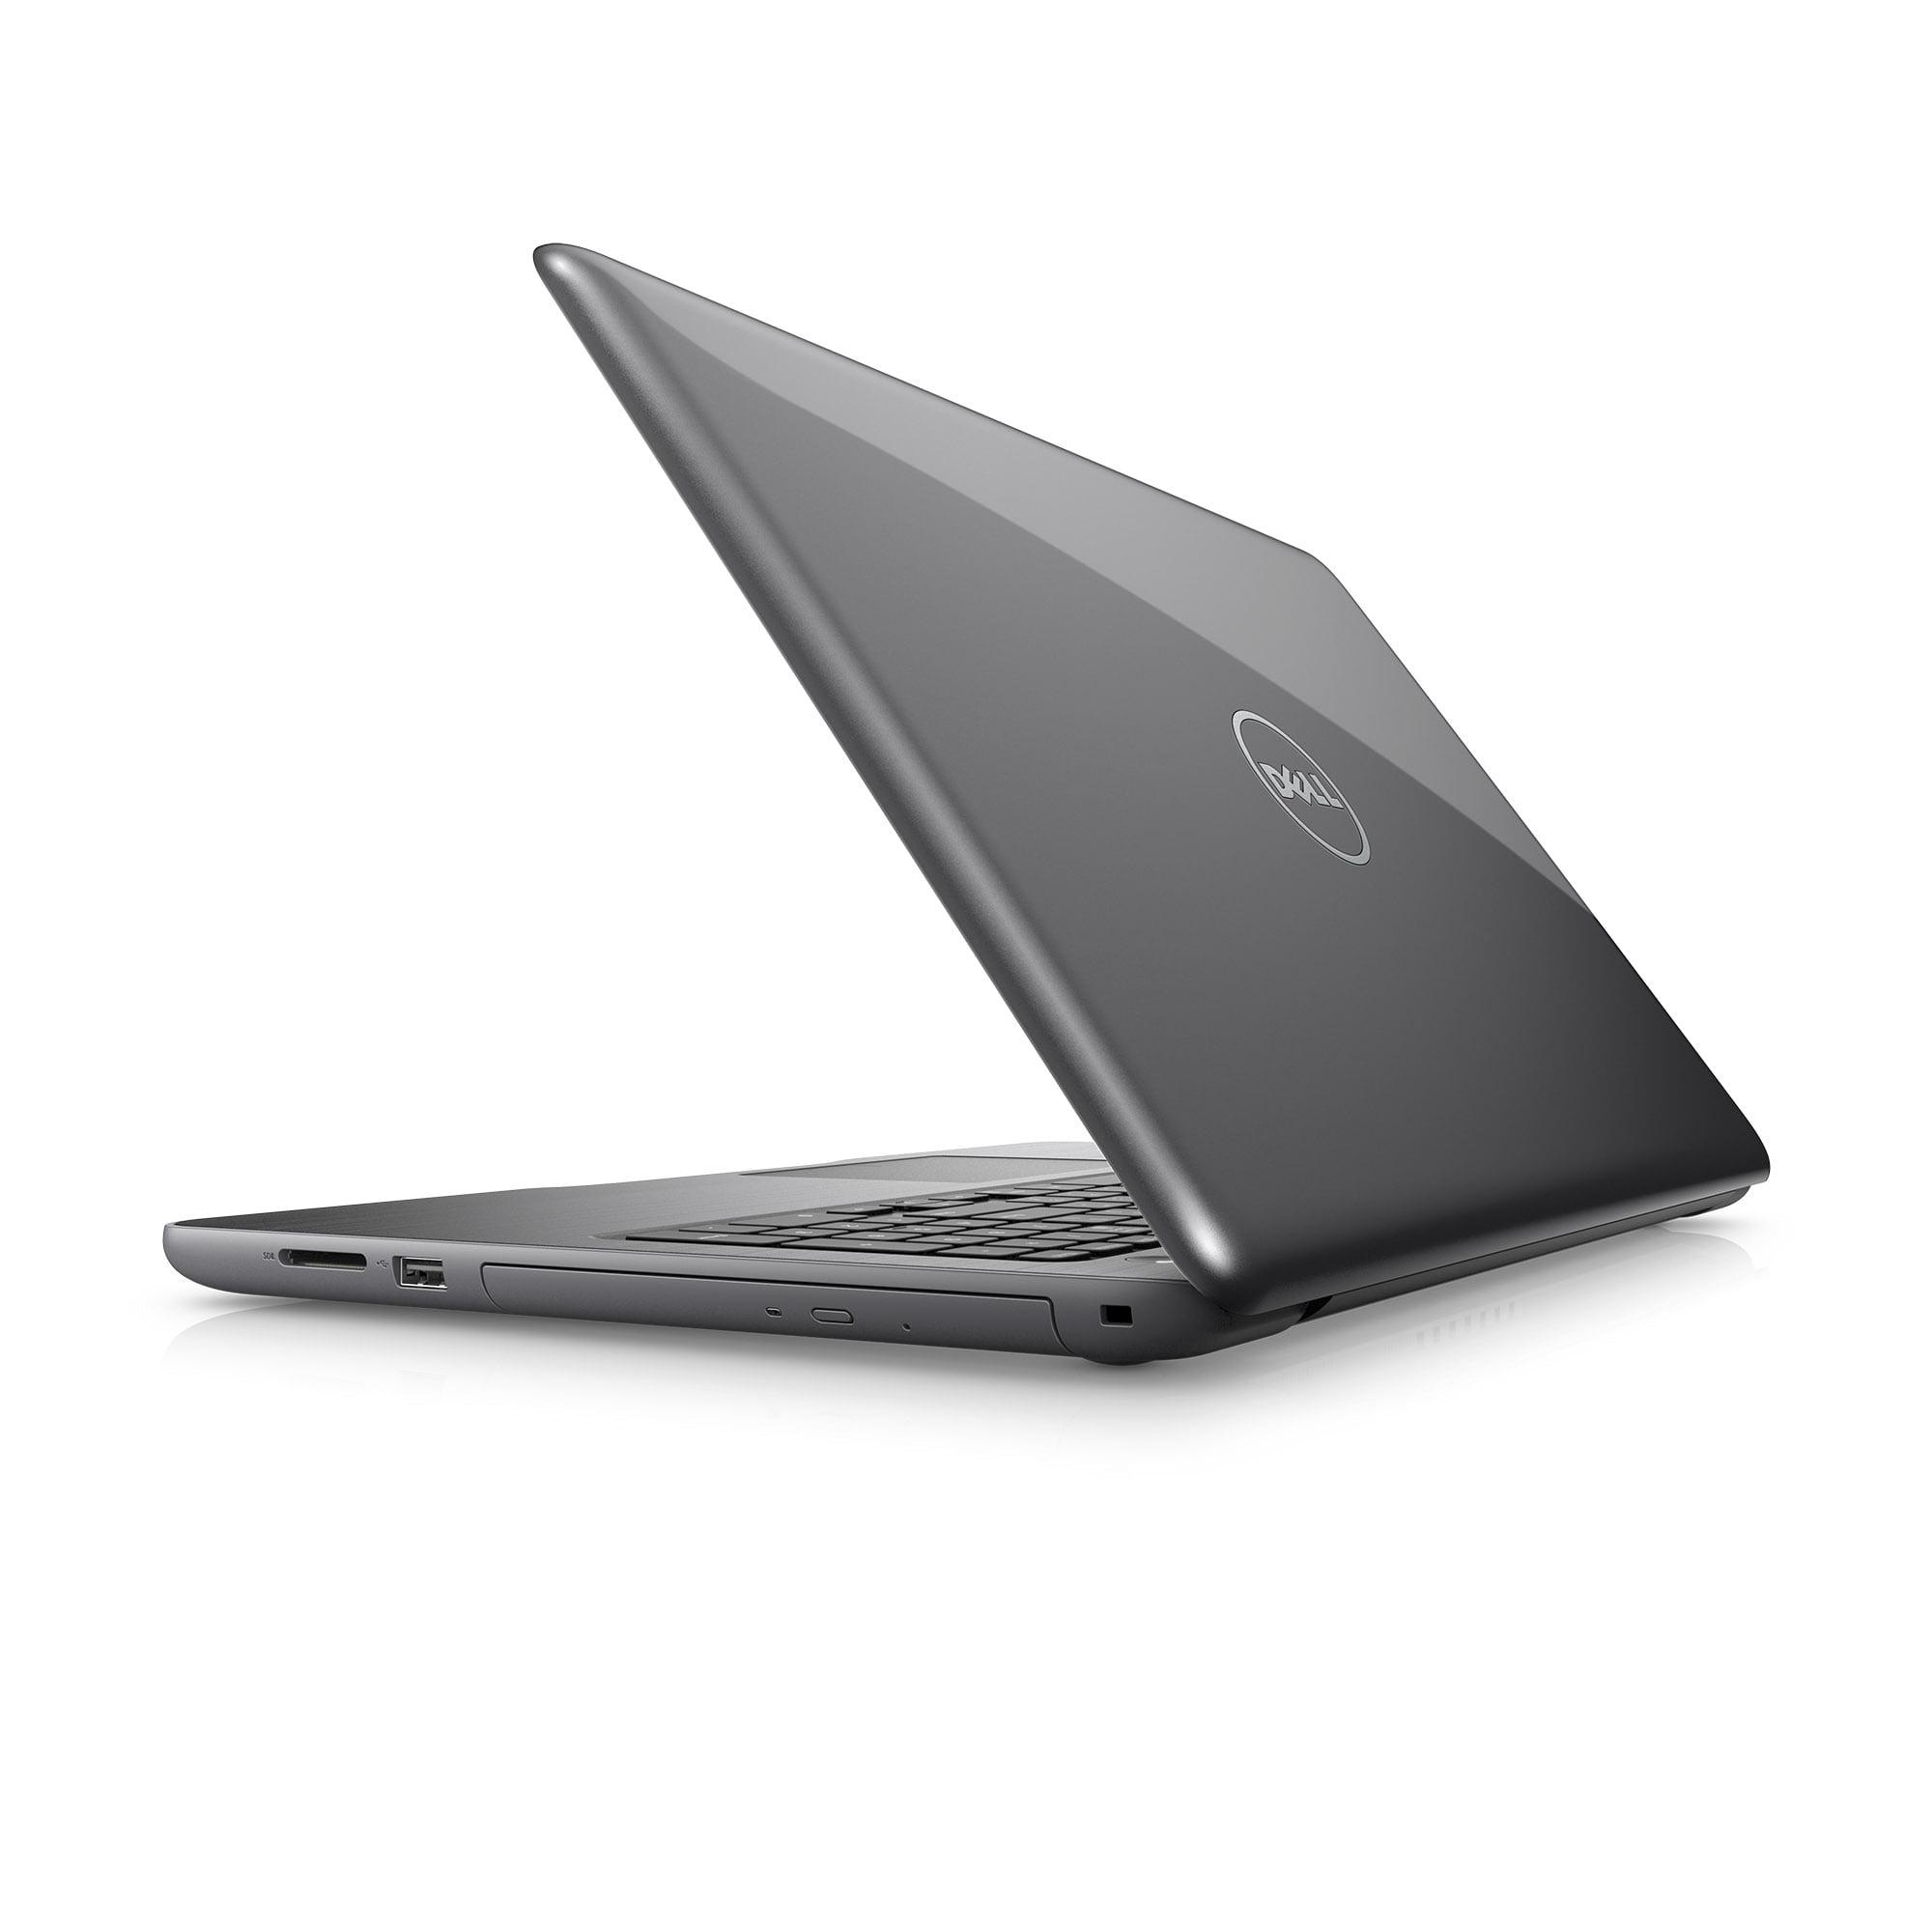 Dell Inspiron 15 Laptop, 15 6